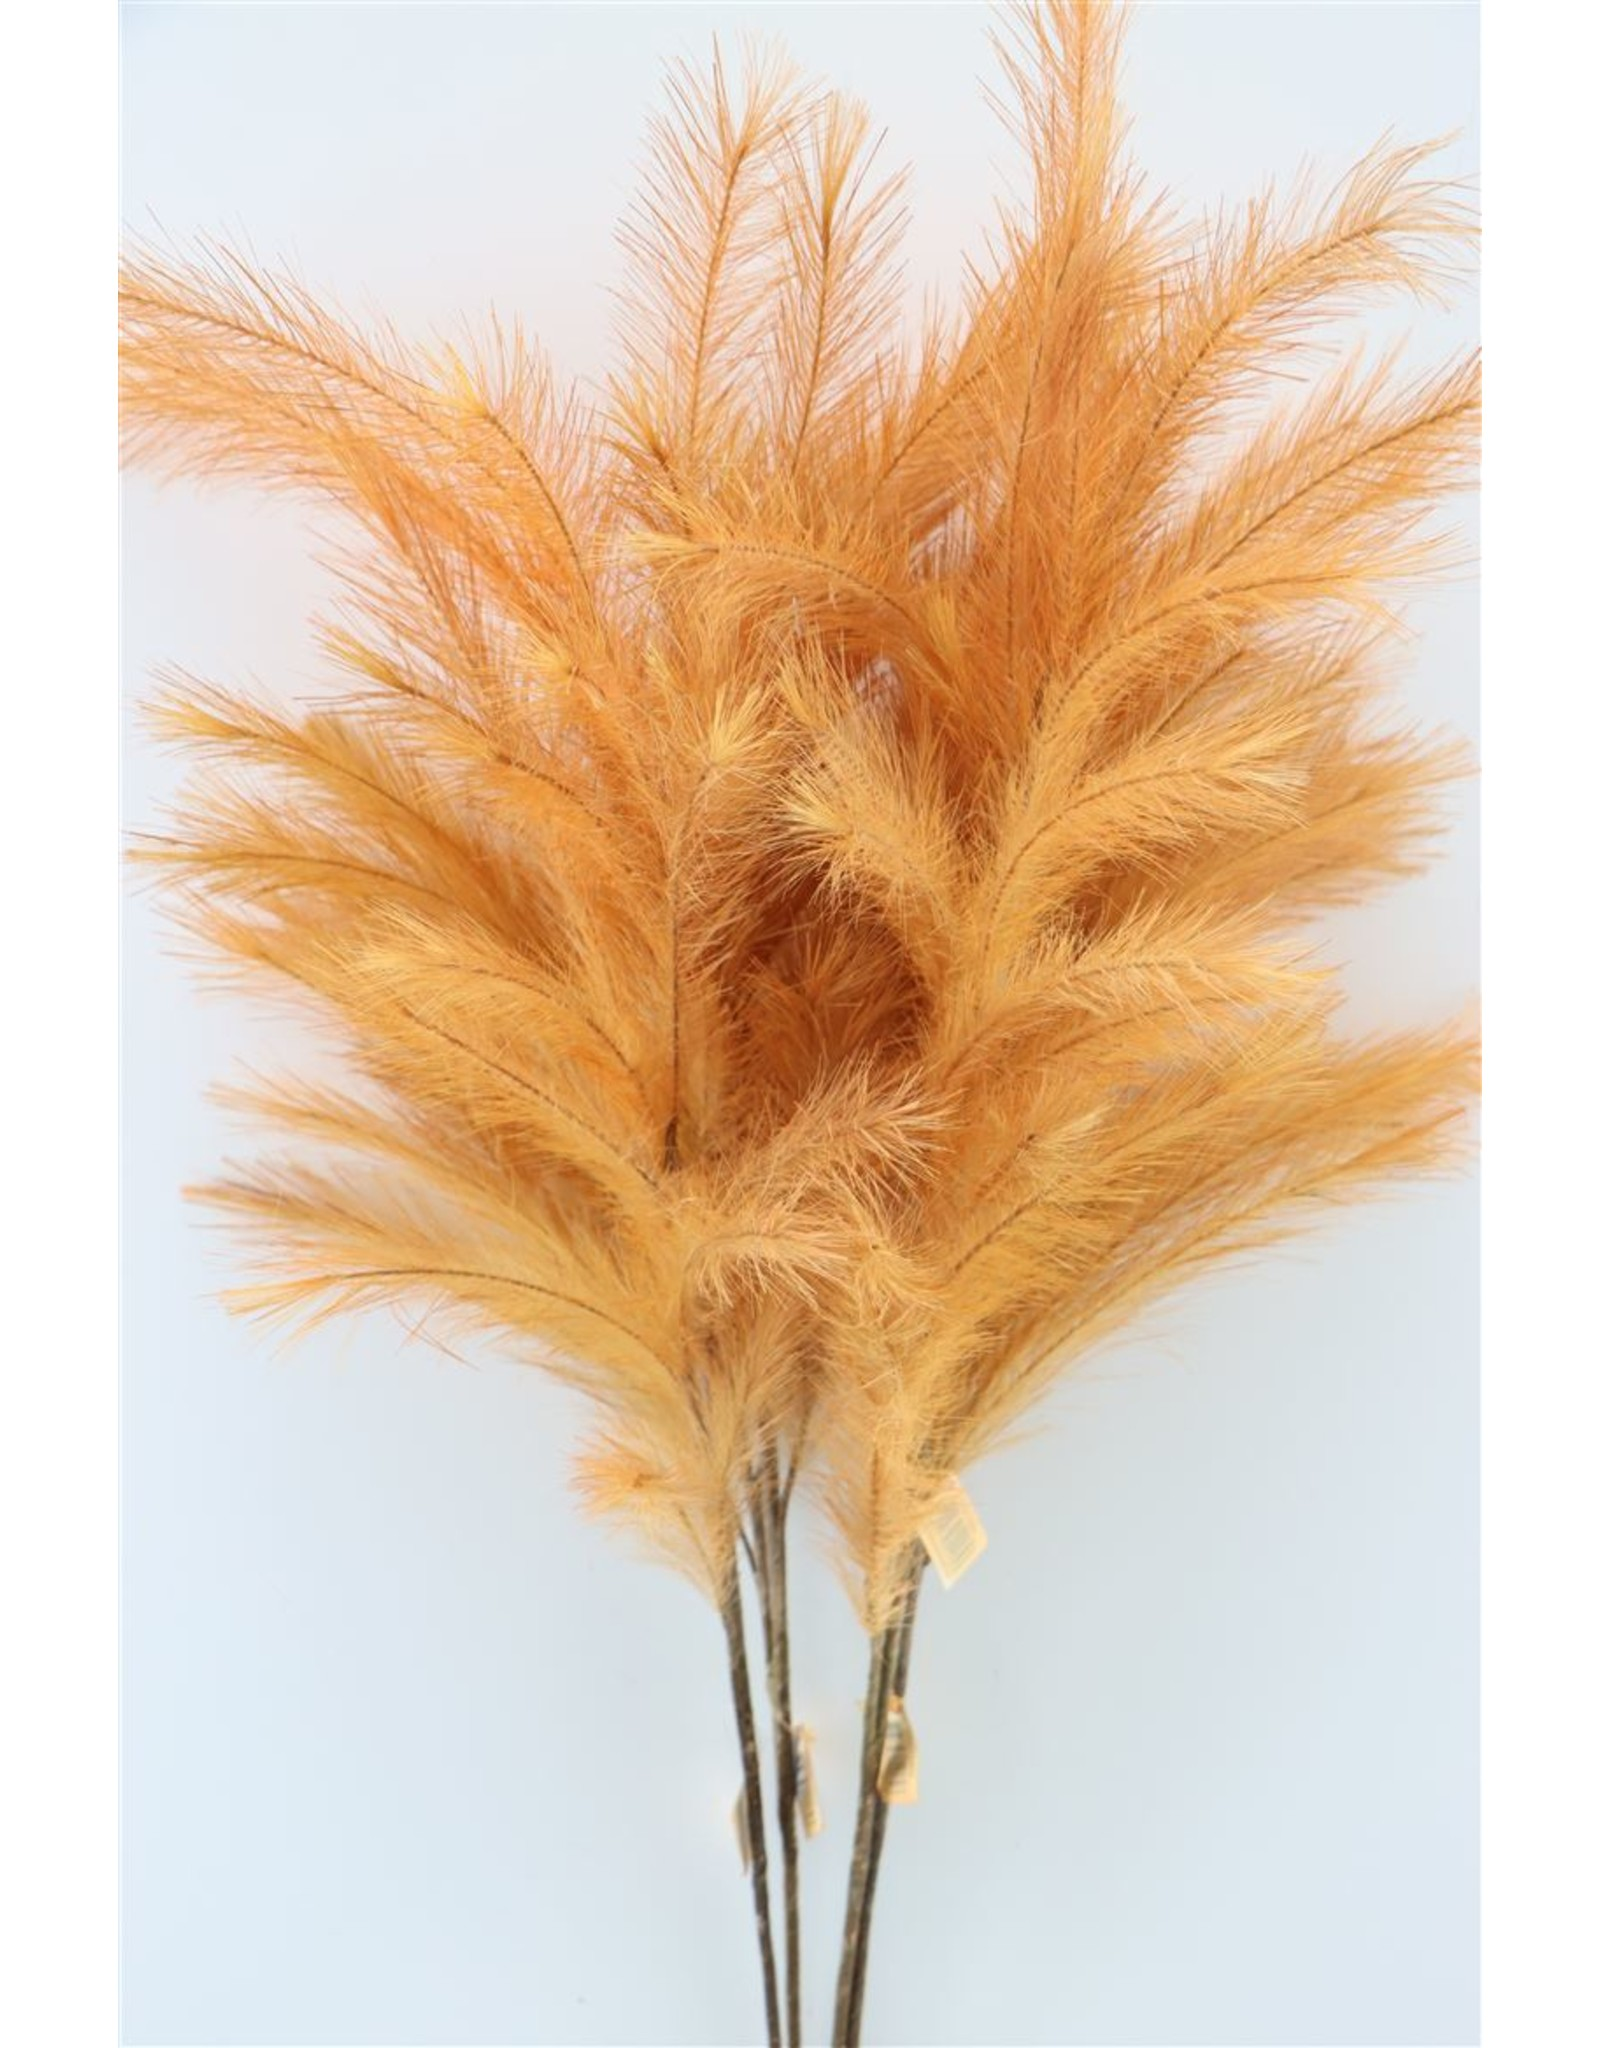 GF Deco Panicle Grass 100cm Salmon P. Stem x 4